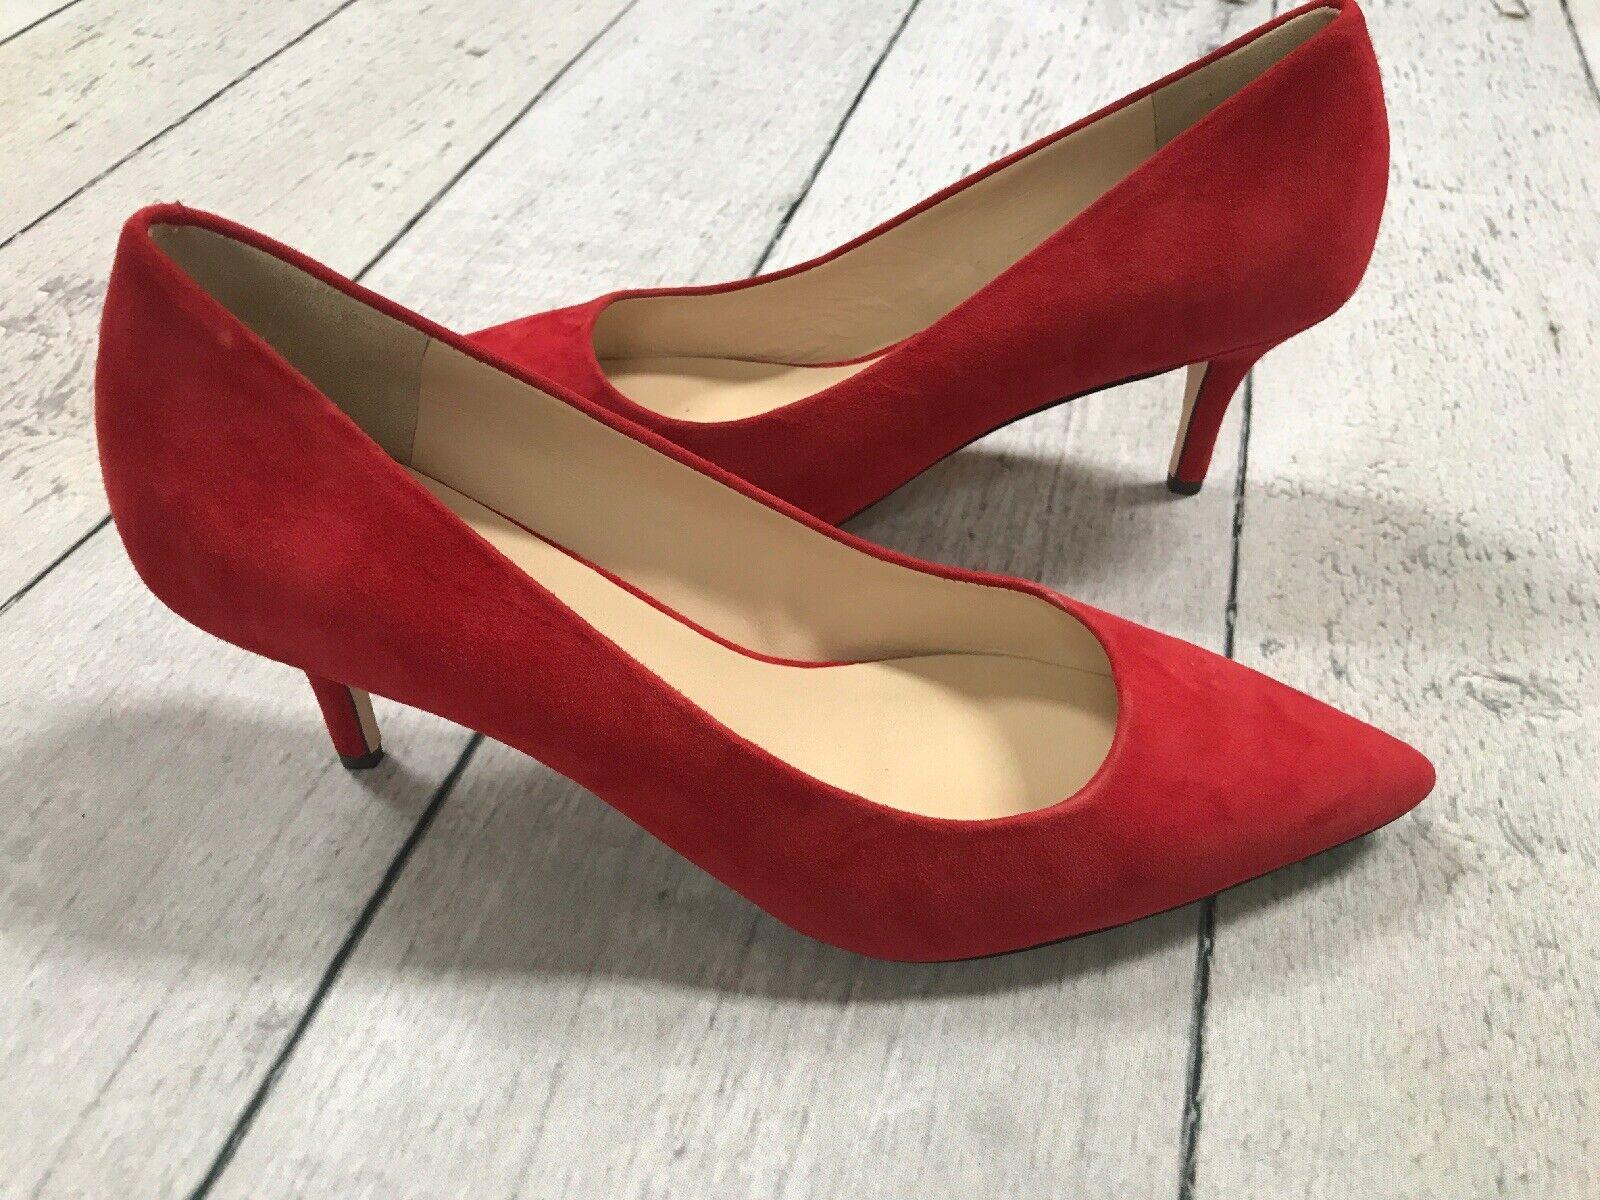 Cole Haan  8.5 Suede rosso Heels Eliza Grand .OS Pump 85mm Cabernet Suede  270  Felice shopping